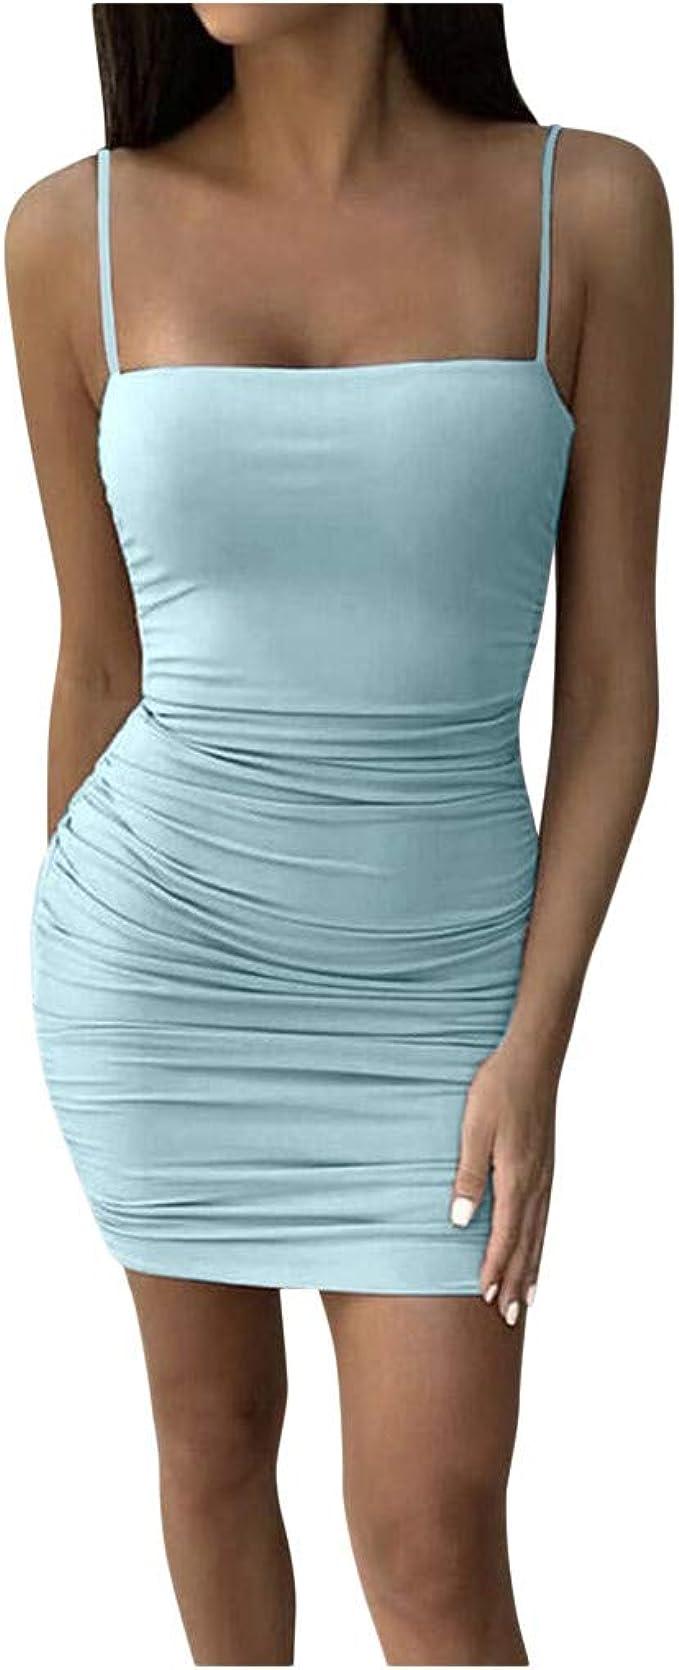 Ywlink Damen Sommer Sling Kurzes Minikleid Kleider Strappy Figurbetontes Kleid Abendkleider Party Club Einfarbig 7 Farbe Amazon De Bekleidung